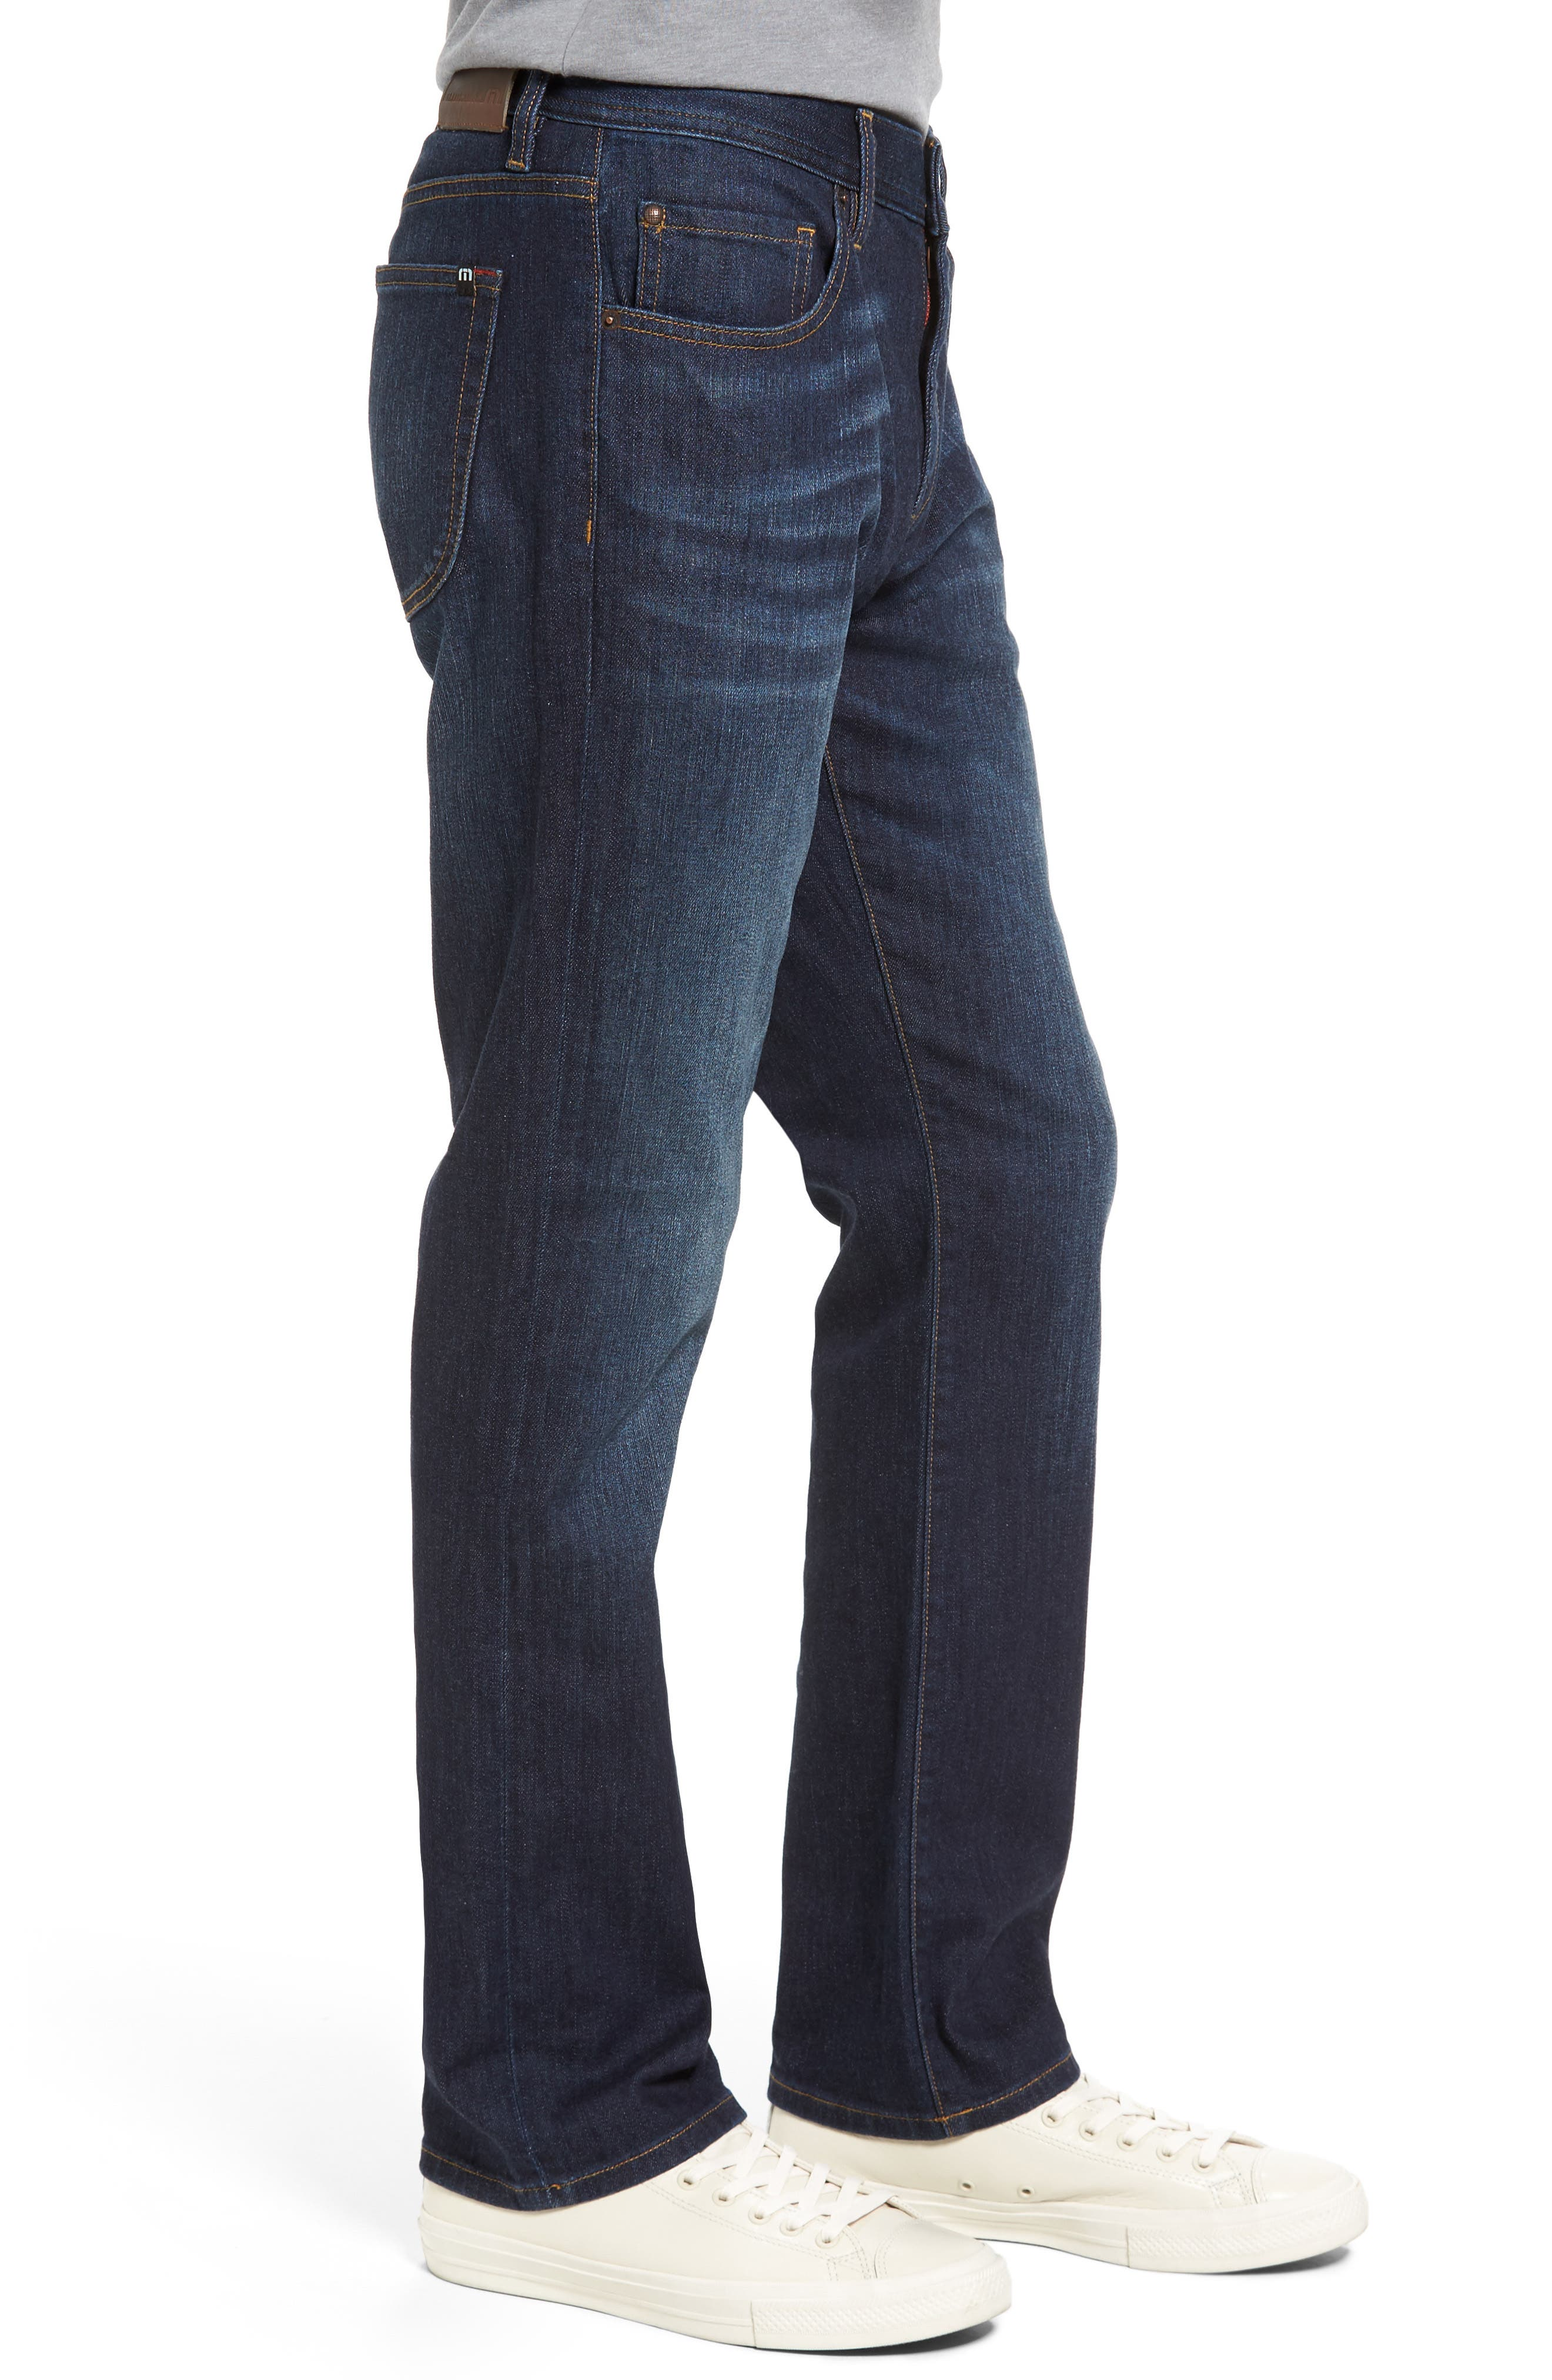 Alternate Image 3  - Travis Mathew 'Duke' Relaxed Fit Jeans (Vintage Indigo)